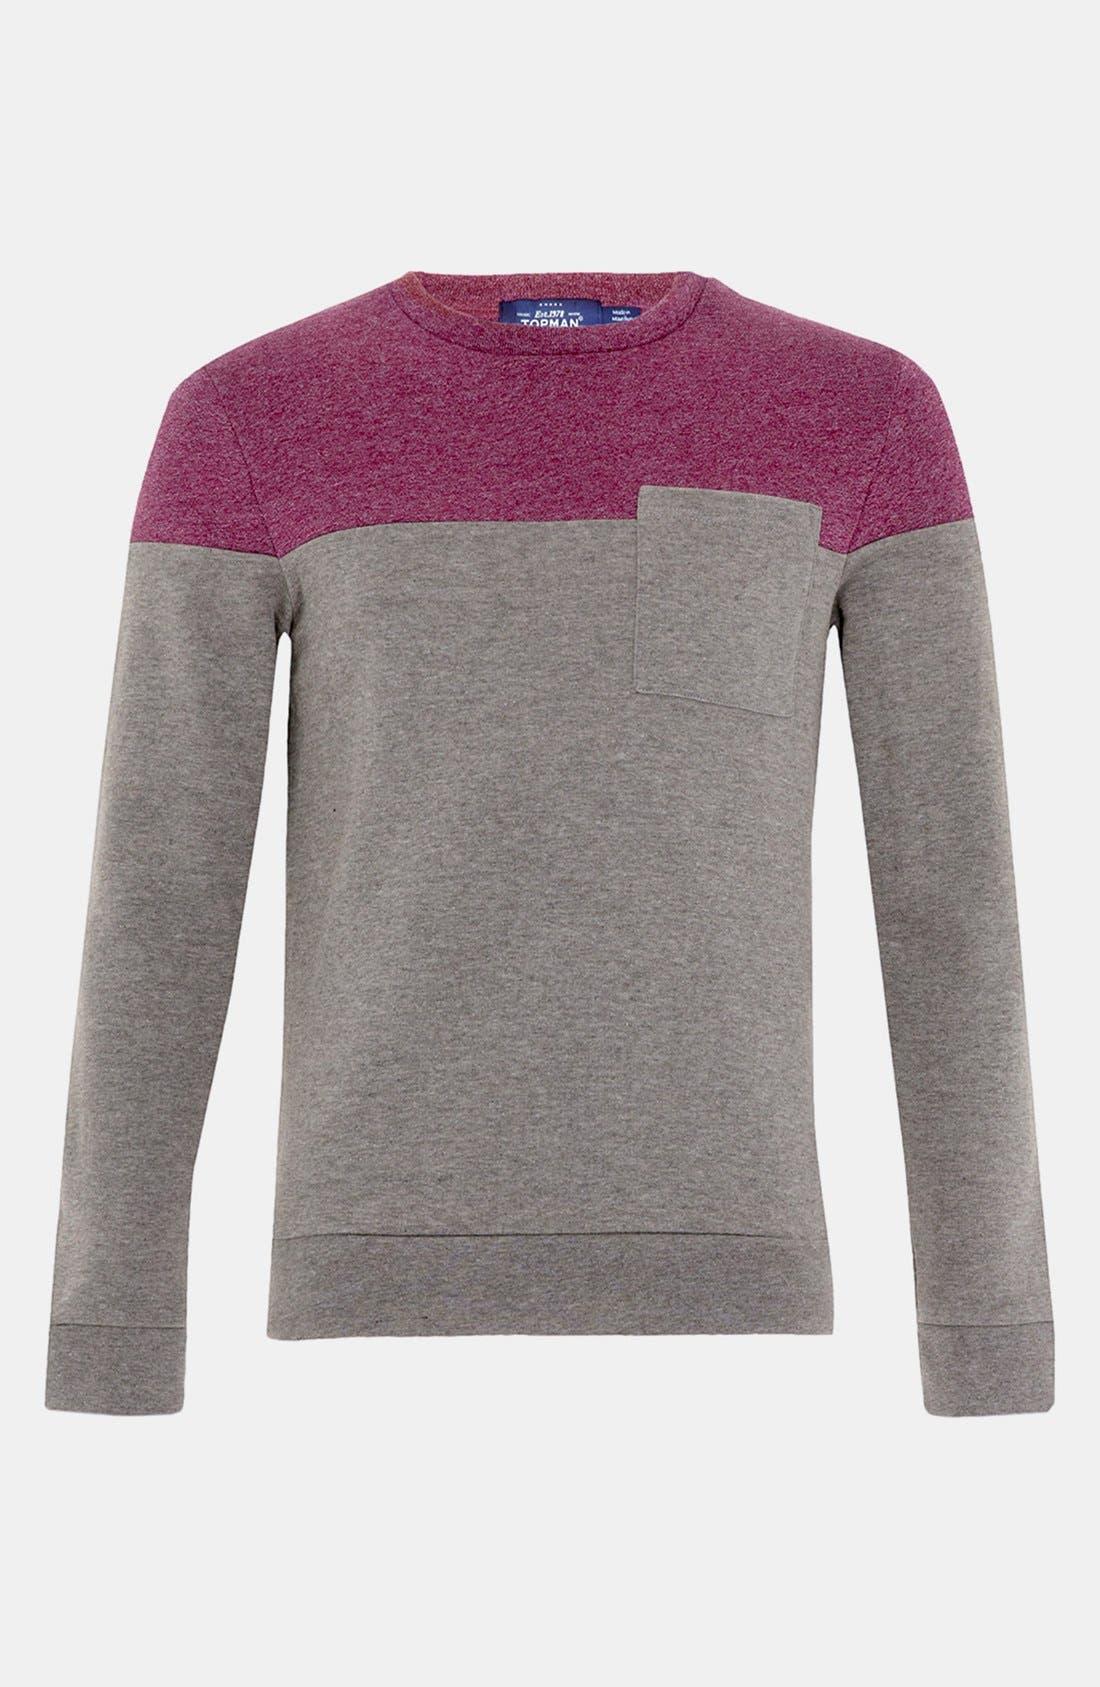 Alternate Image 1 Selected - Topman Cut & Sew Crewneck Sweatshirt